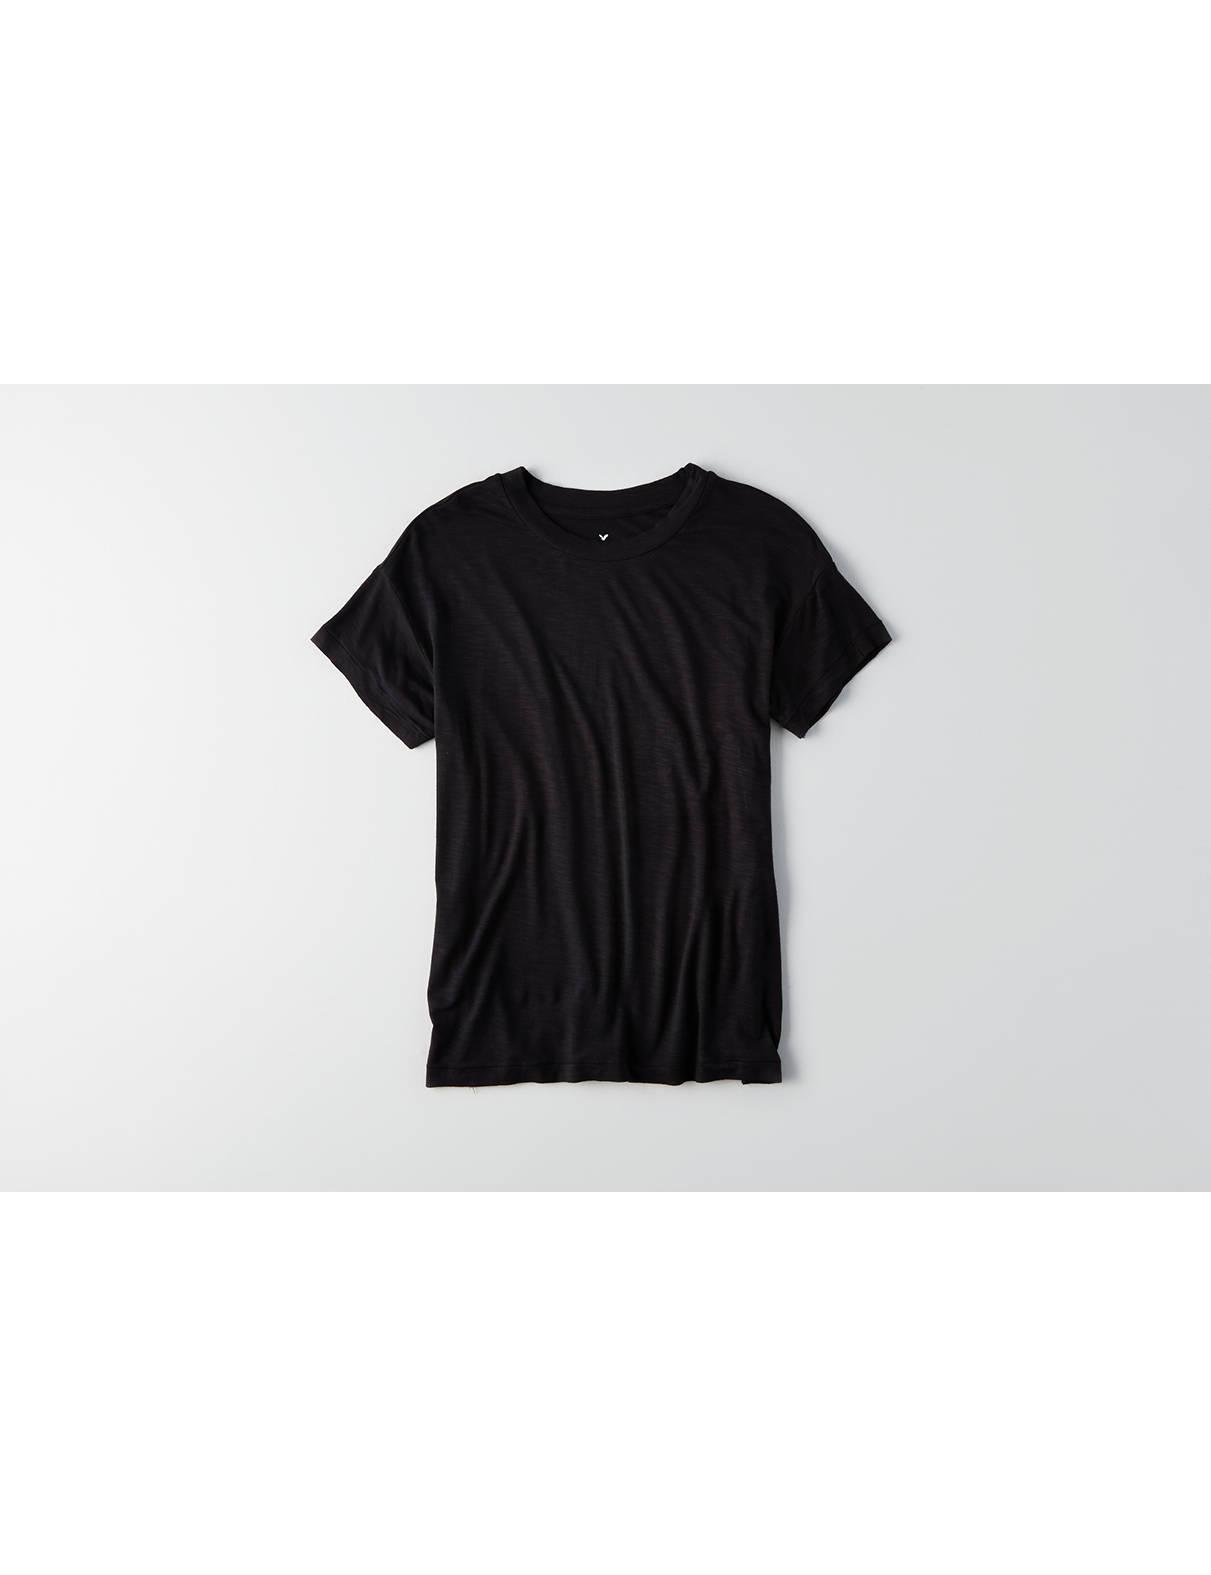 Plain black t shirt xxl - Display Product Reviews For Aeo Soft Sexy Crew Favorite T Shirt